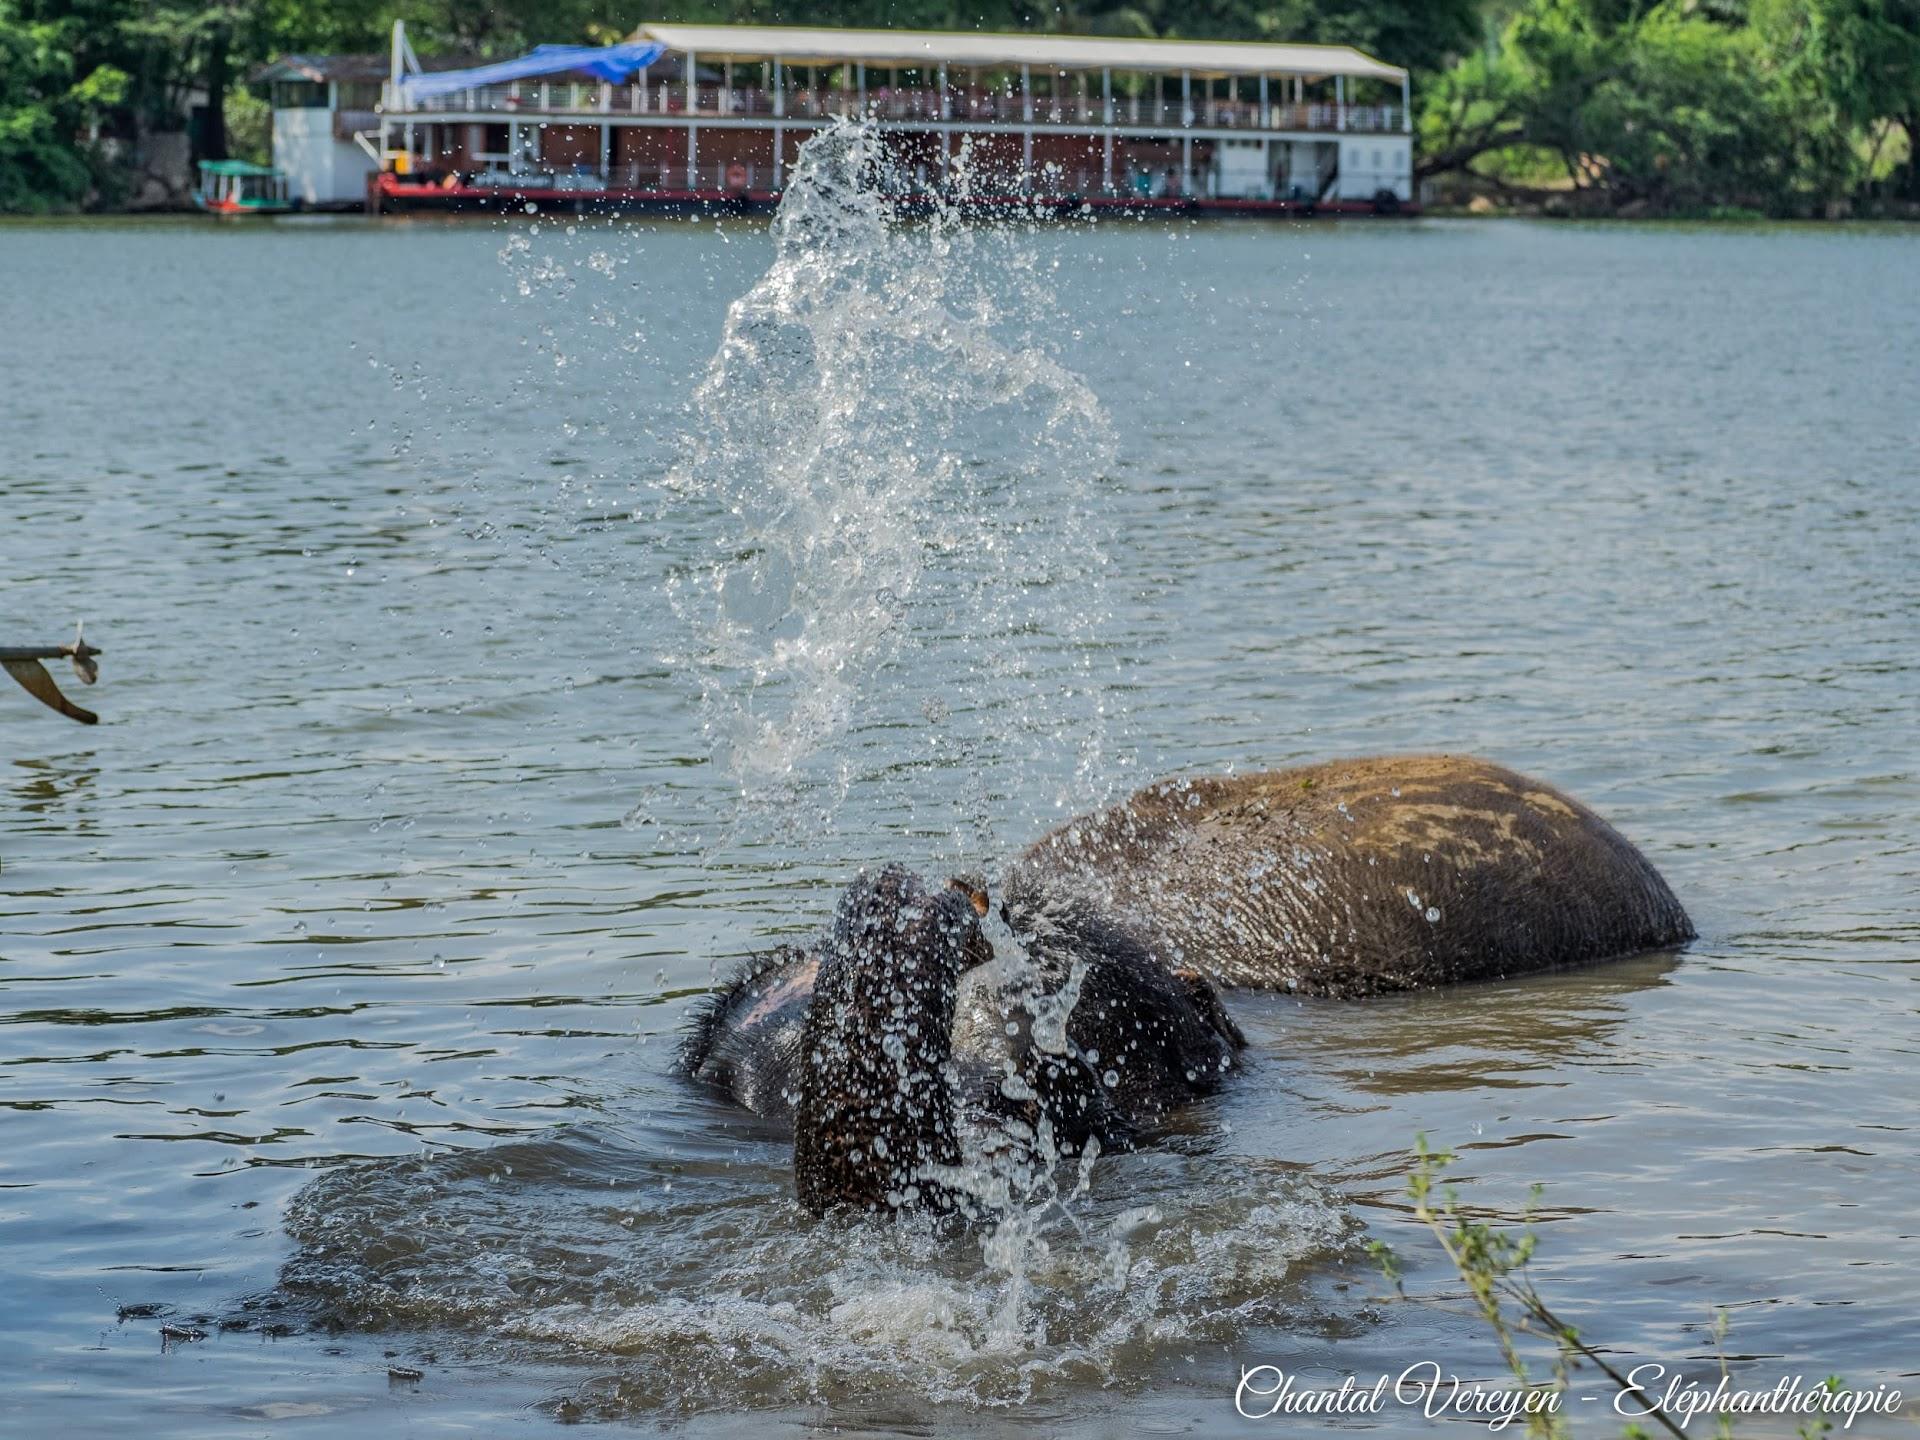 ChiangRaï,Staged'éléphanthérapieChantalVereyen